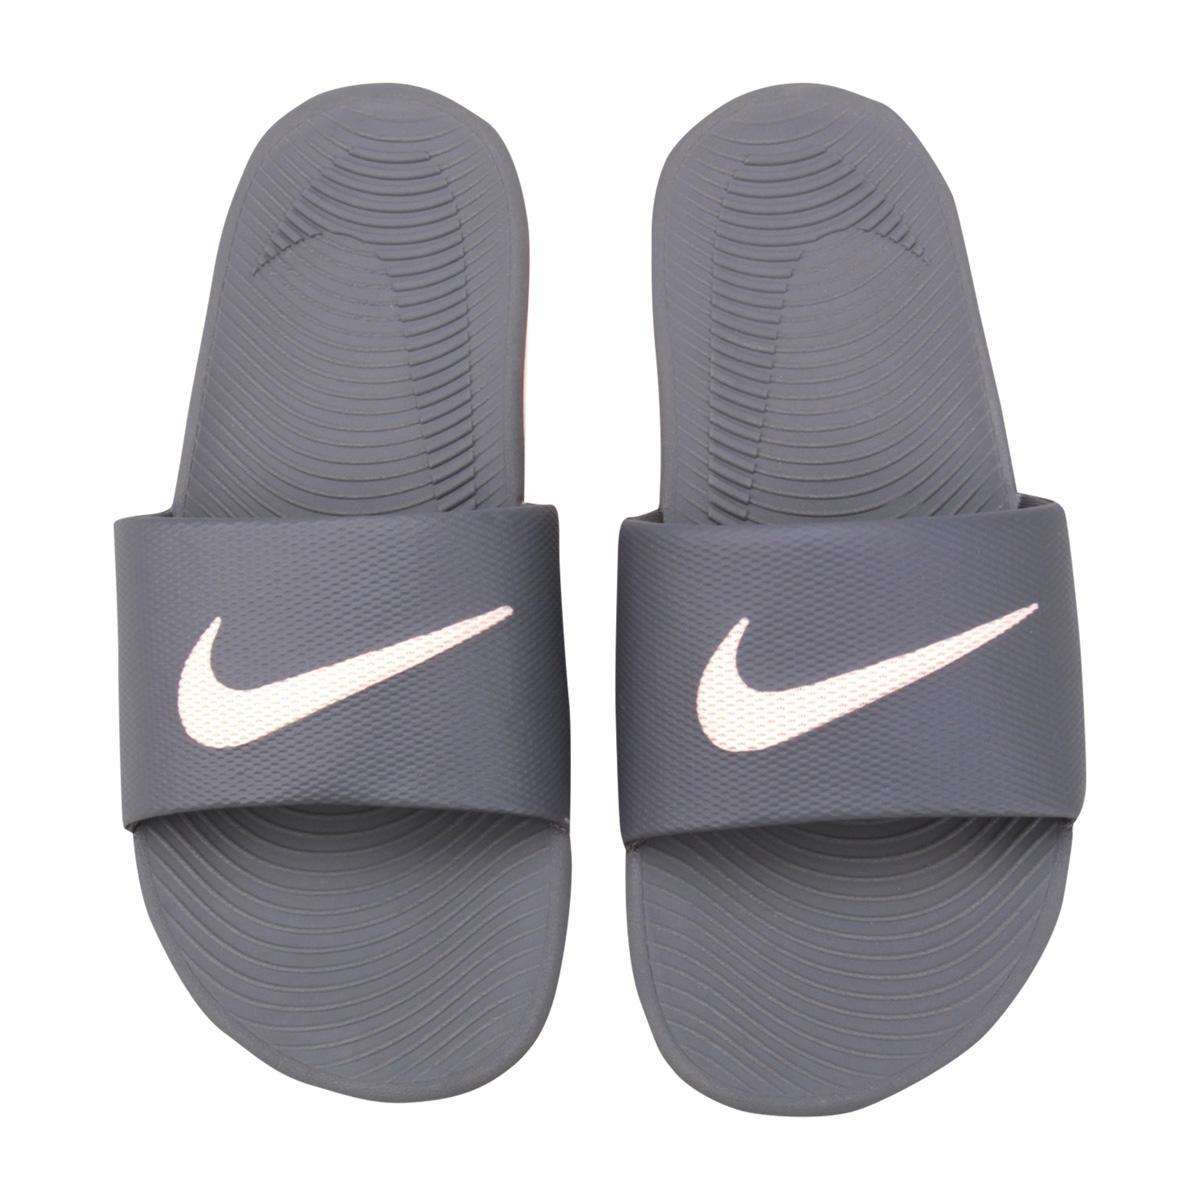 5e6af5b85e4129 Shopping Smiles - Sandália Nike Wmns Kawa Slide